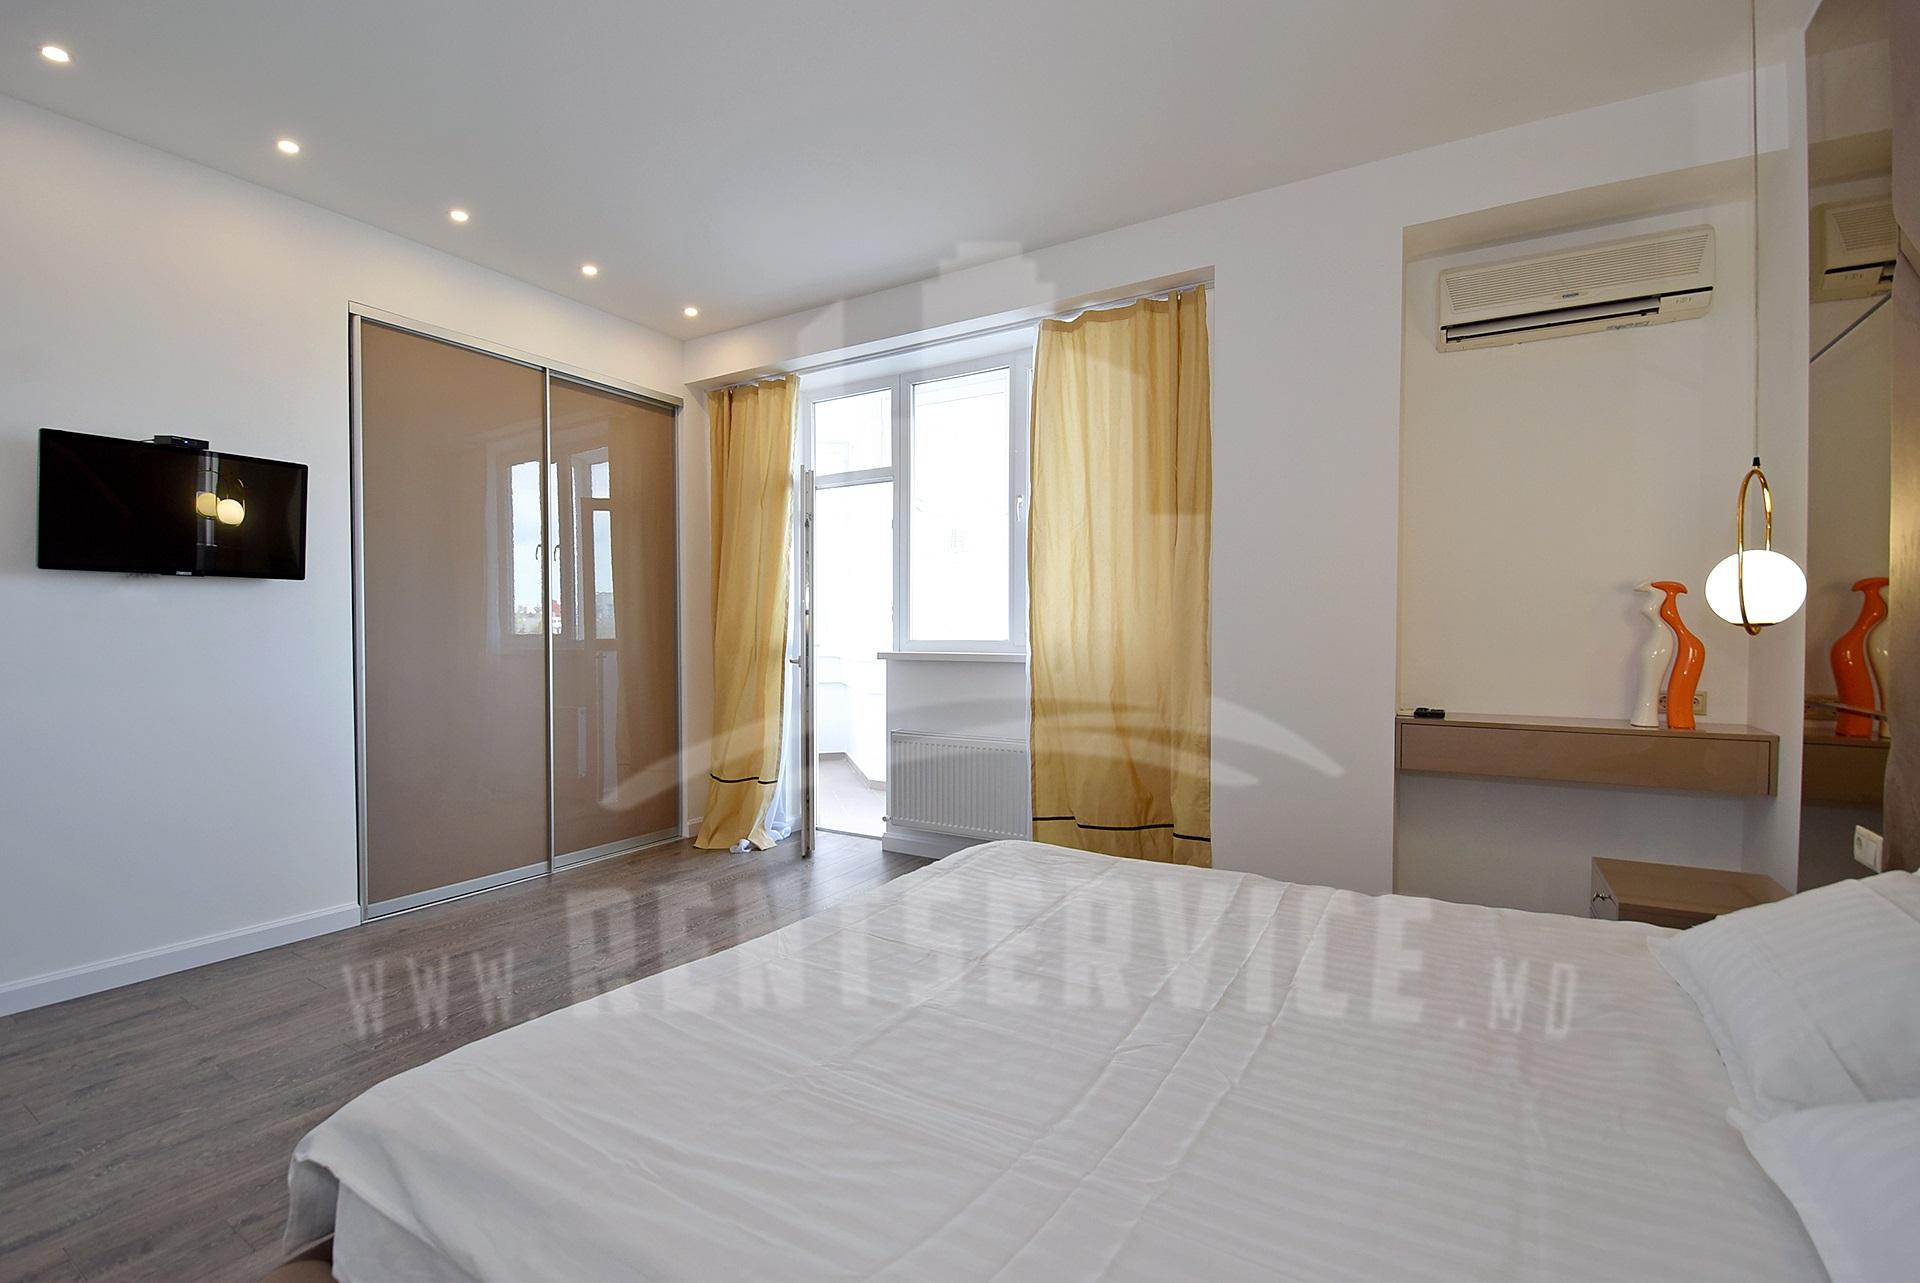 285_apartment_11.JPG